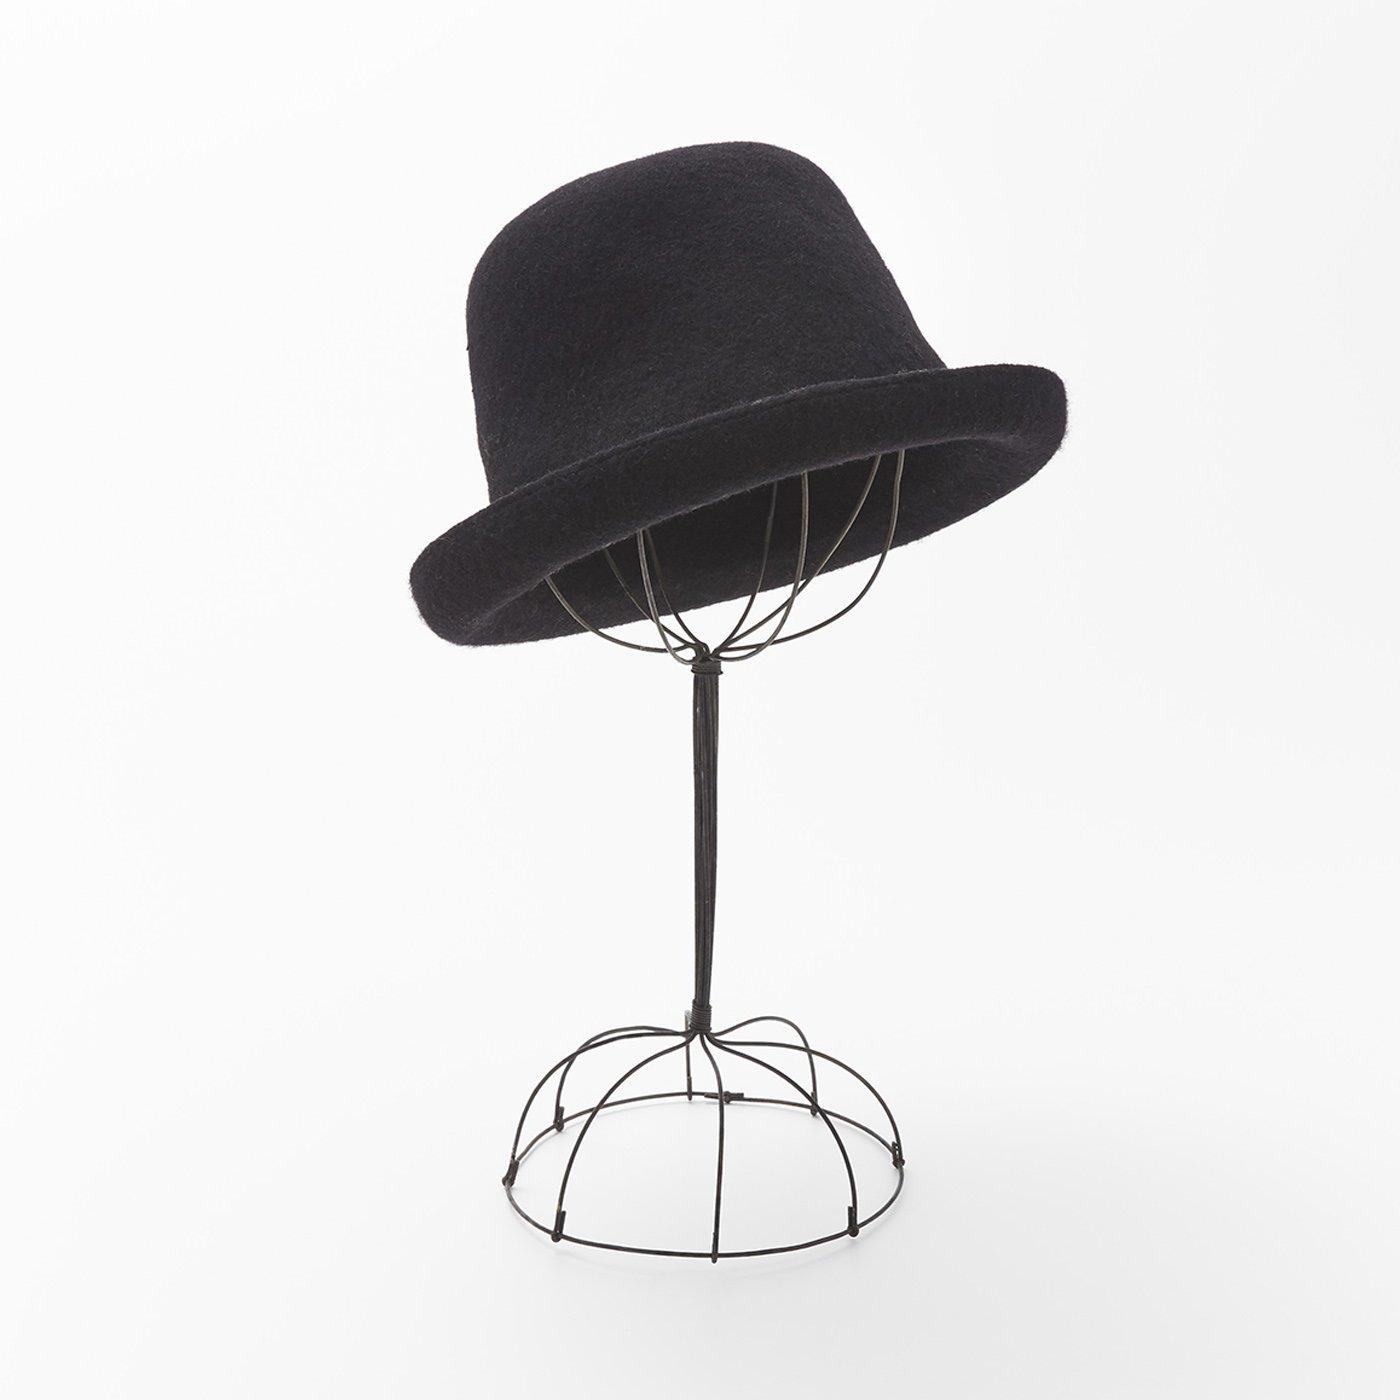 odds バスクのハット帽〈ブラック〉